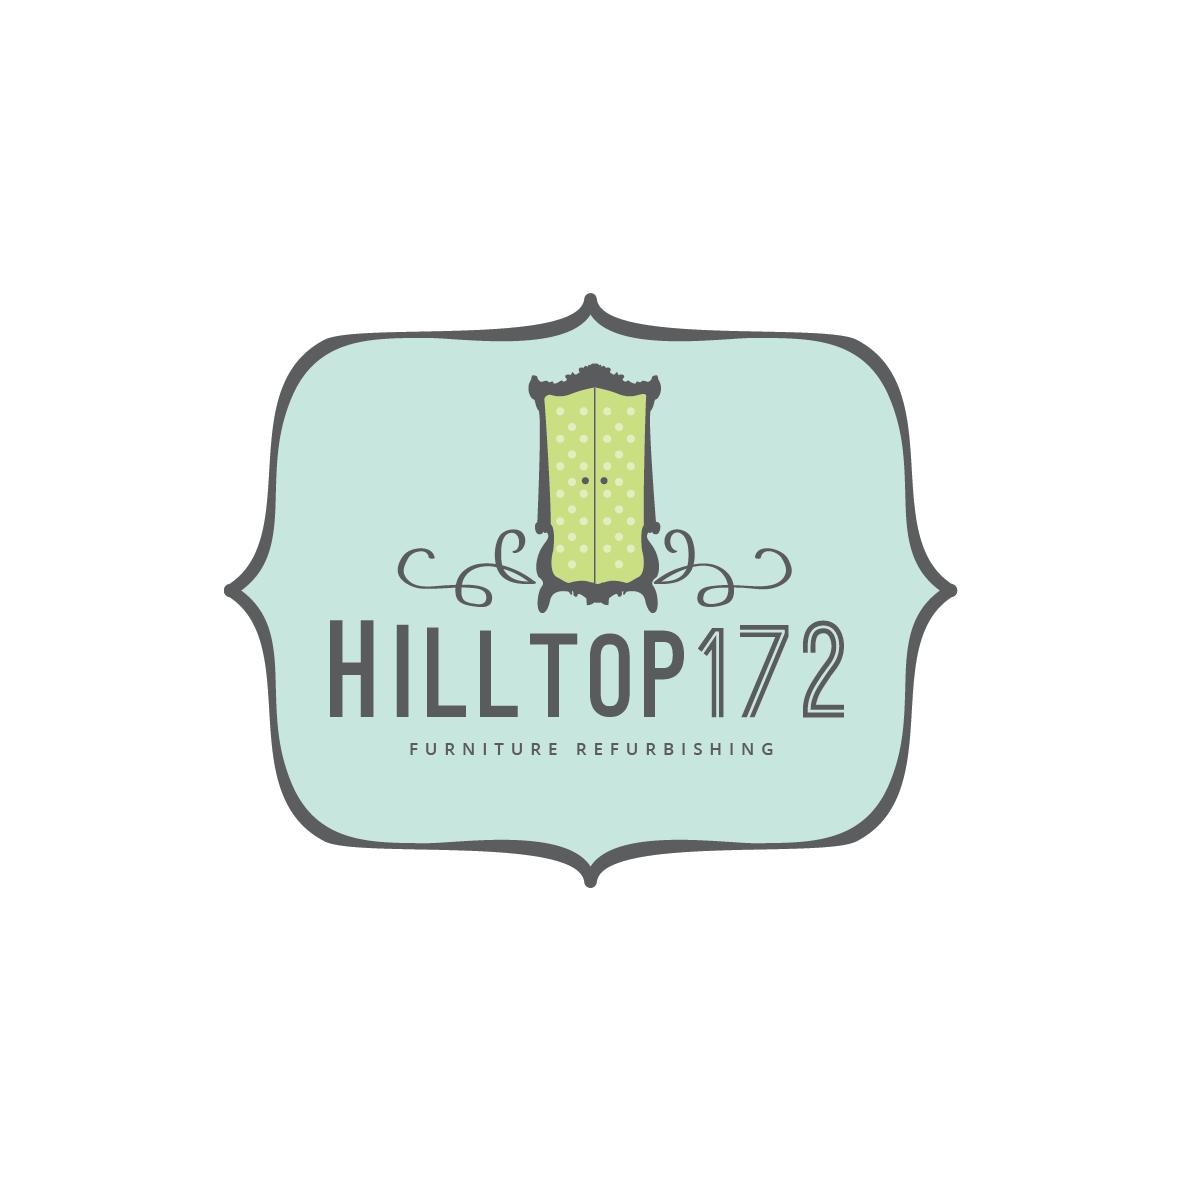 Create whimsical furniture illustration for Hilltop 172